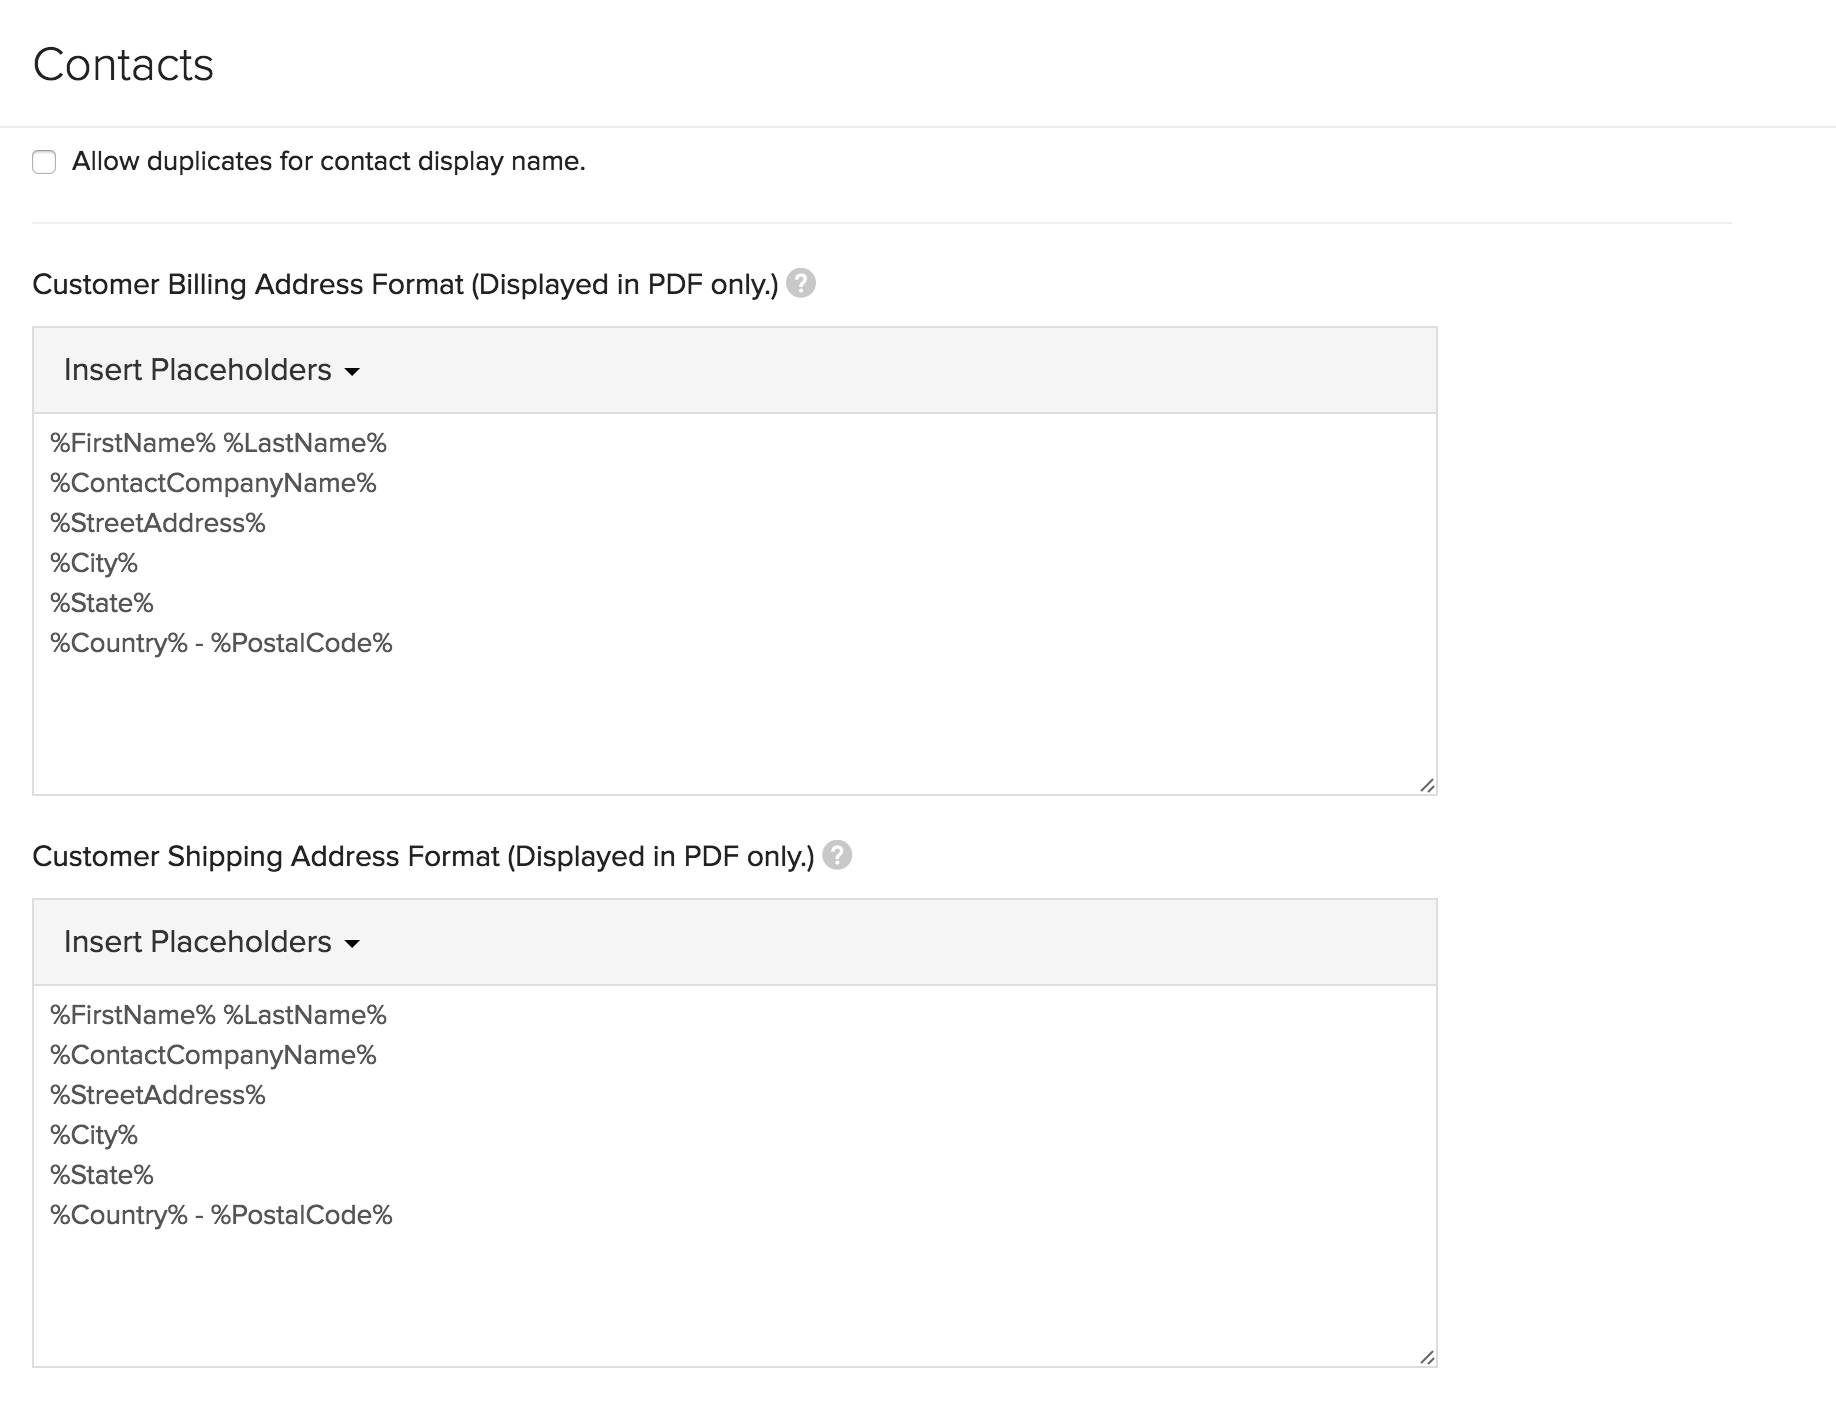 Contact Preferences